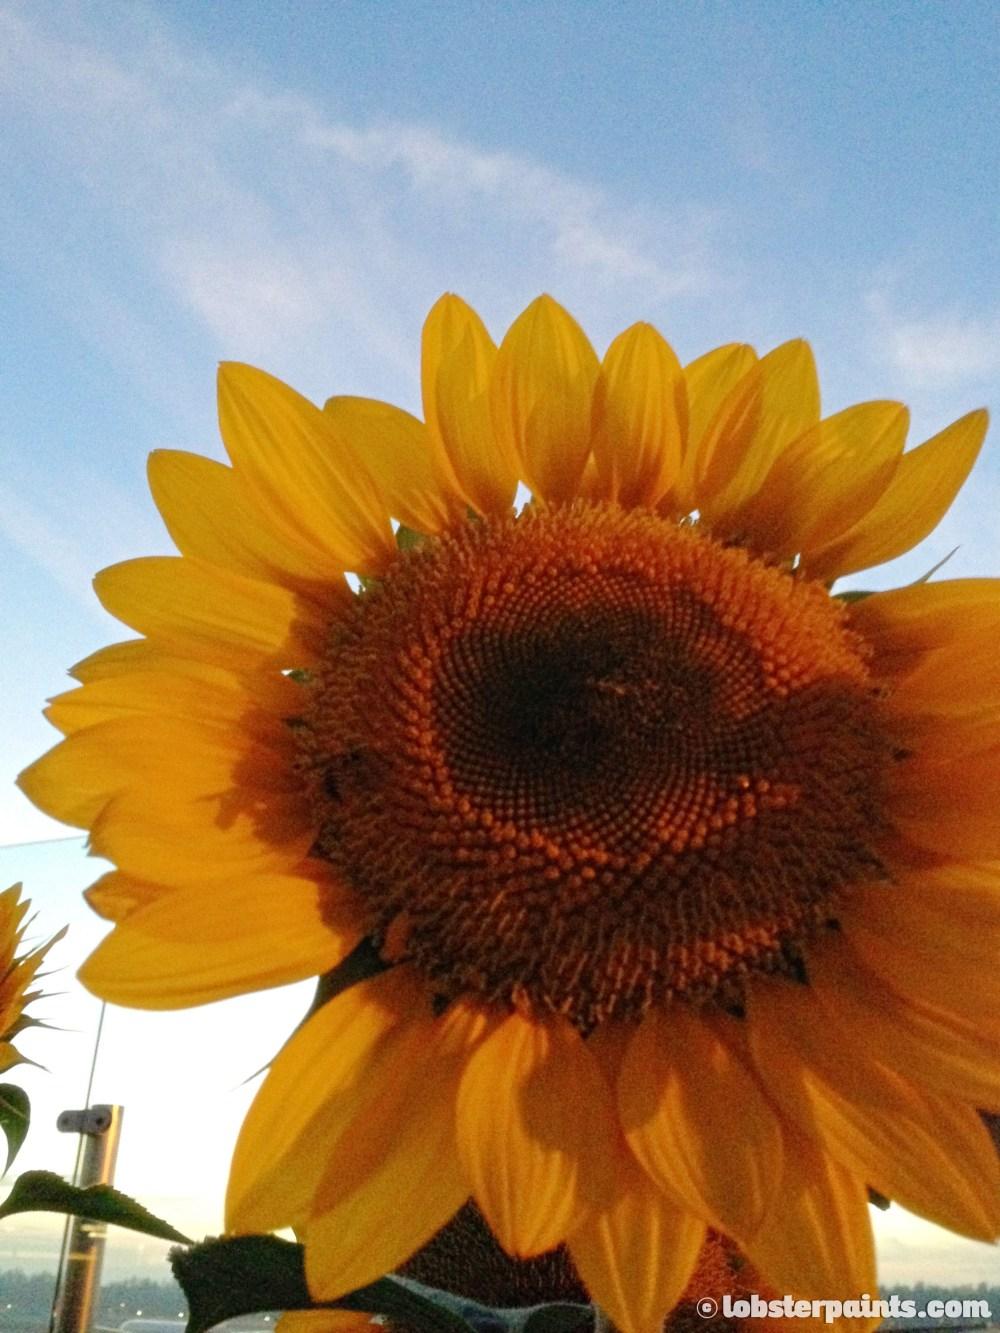 sunflower-garden--changi-airport-t2-singapore_13620427023_o